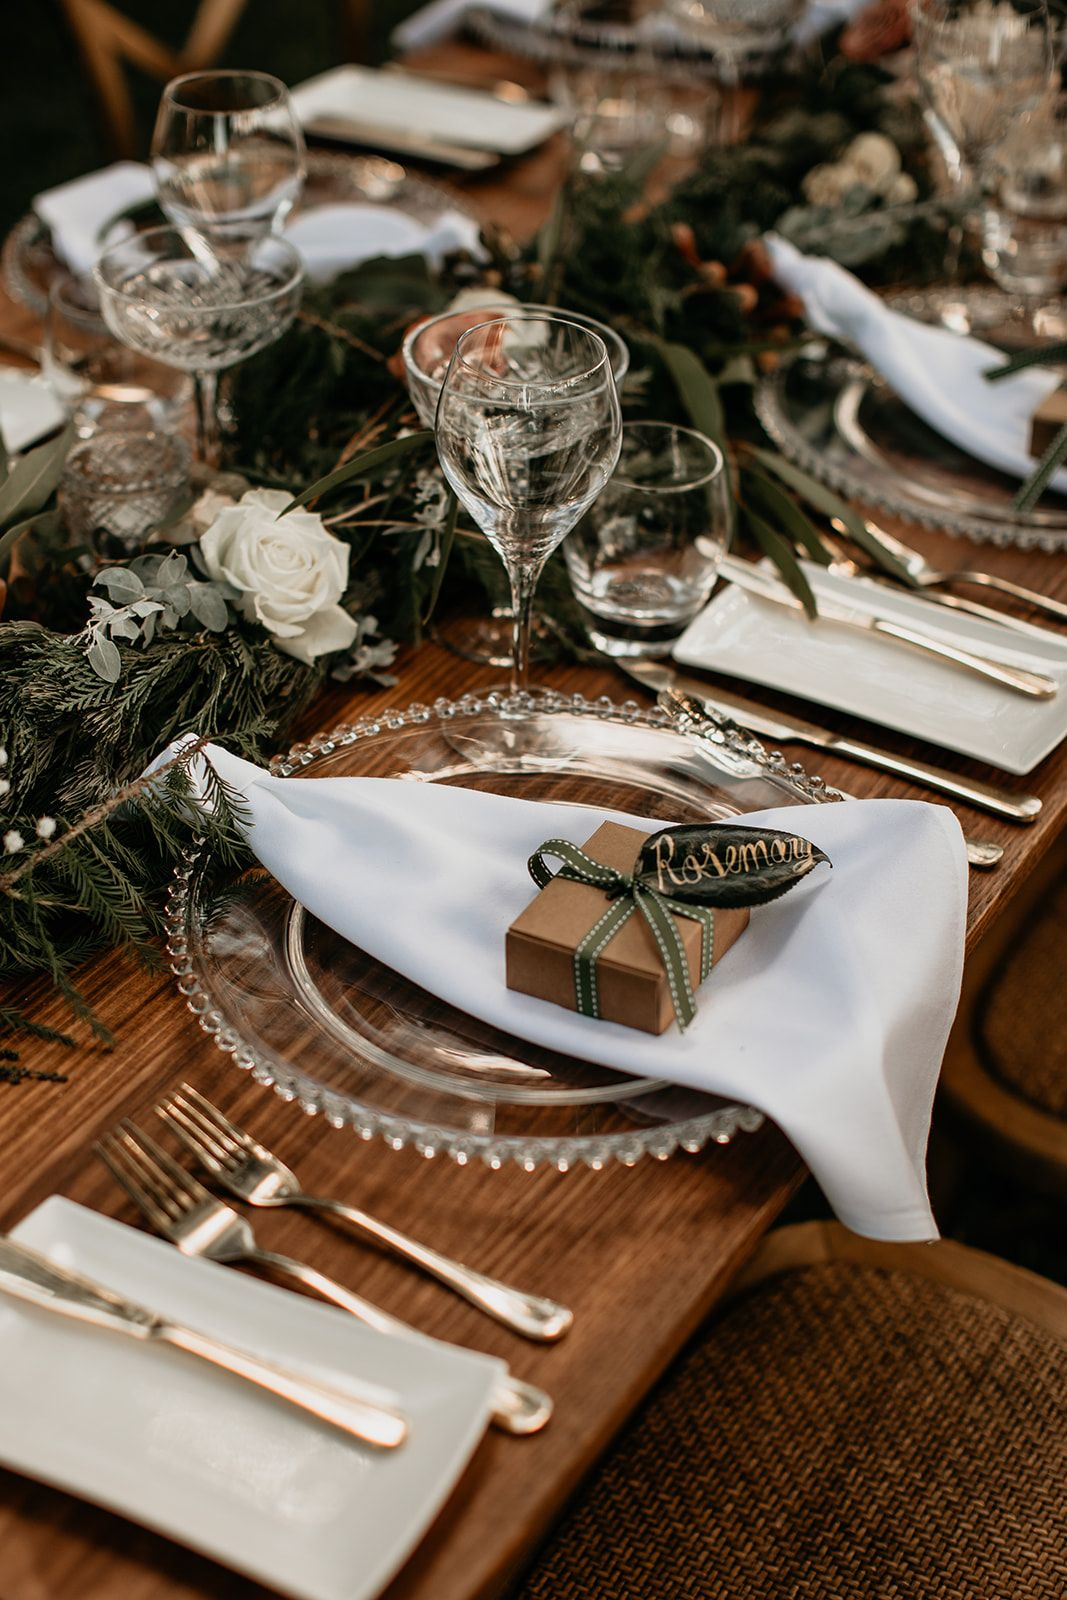 Boho wedding reception with glass plates, green leafy